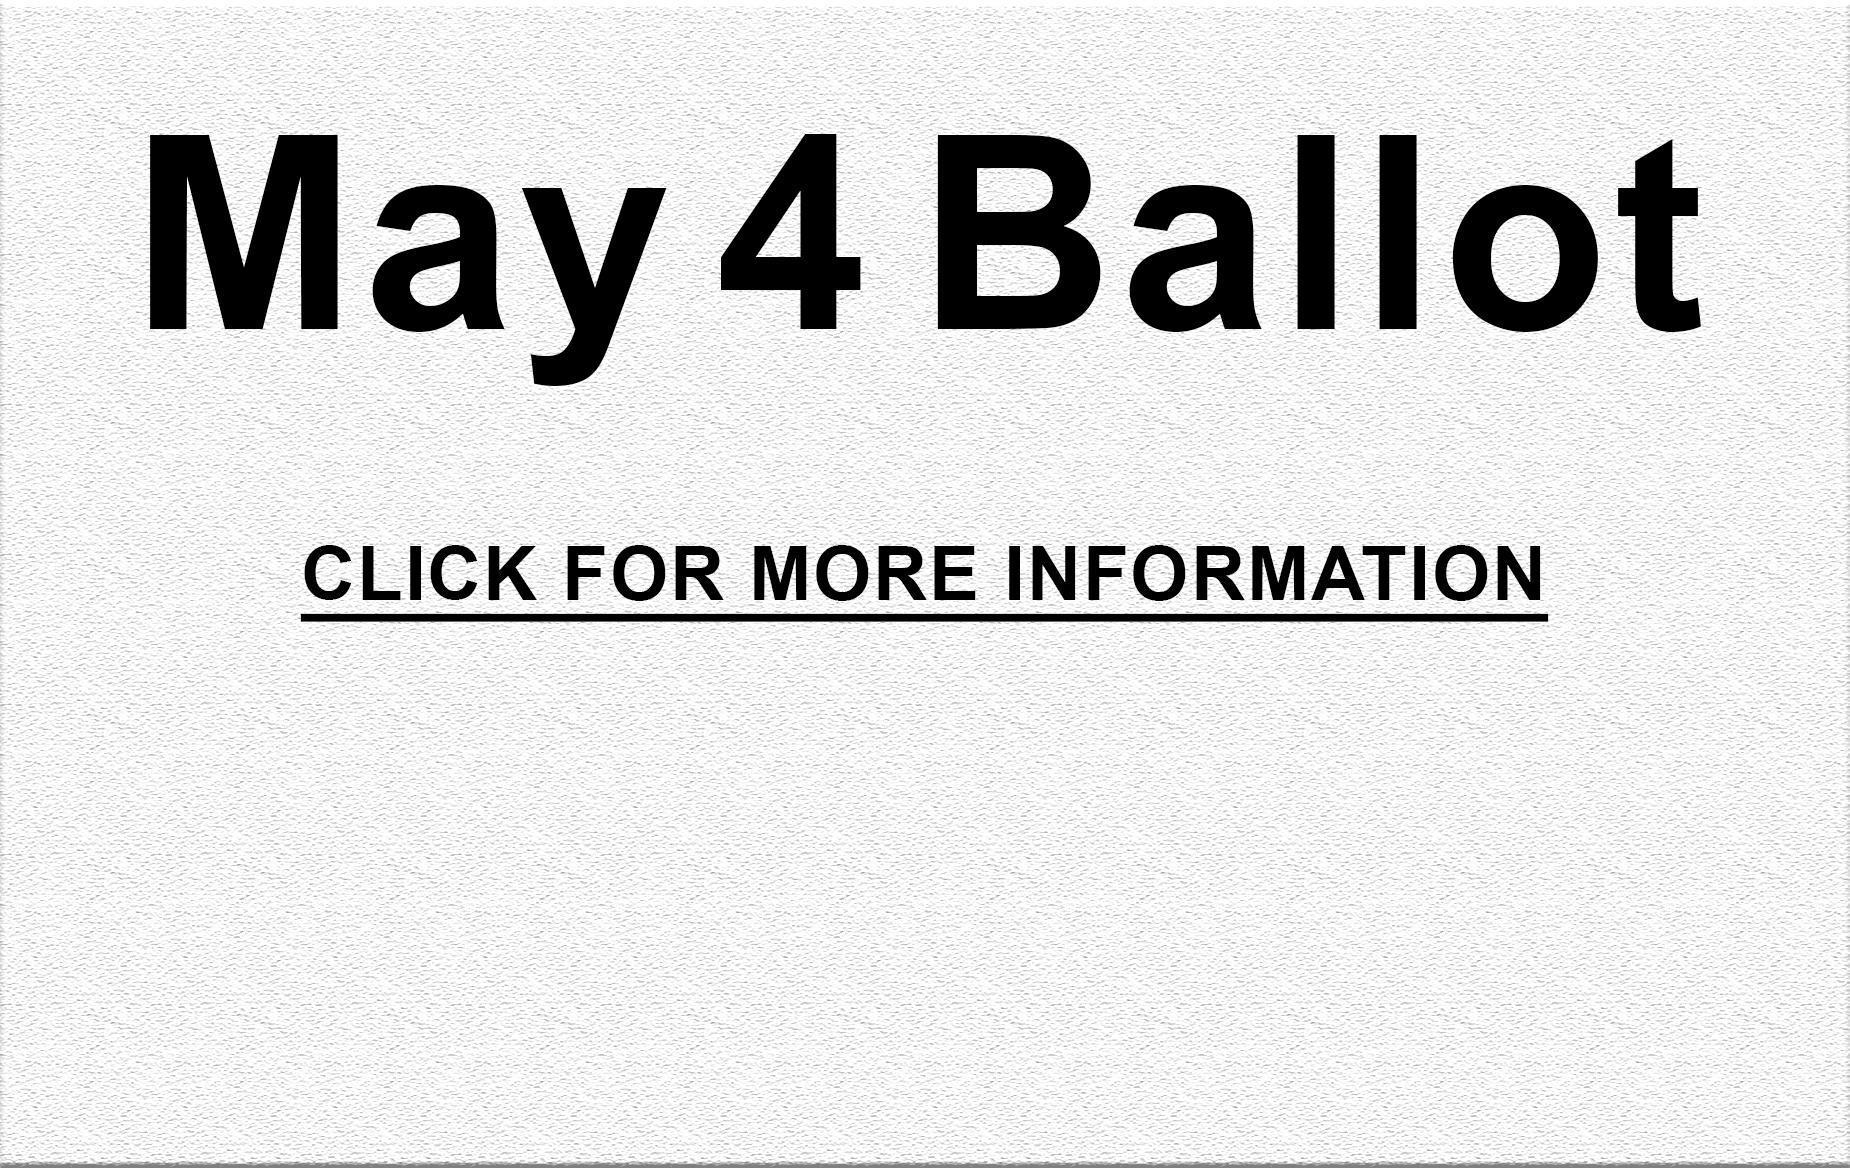 May 4 Ballot Issue